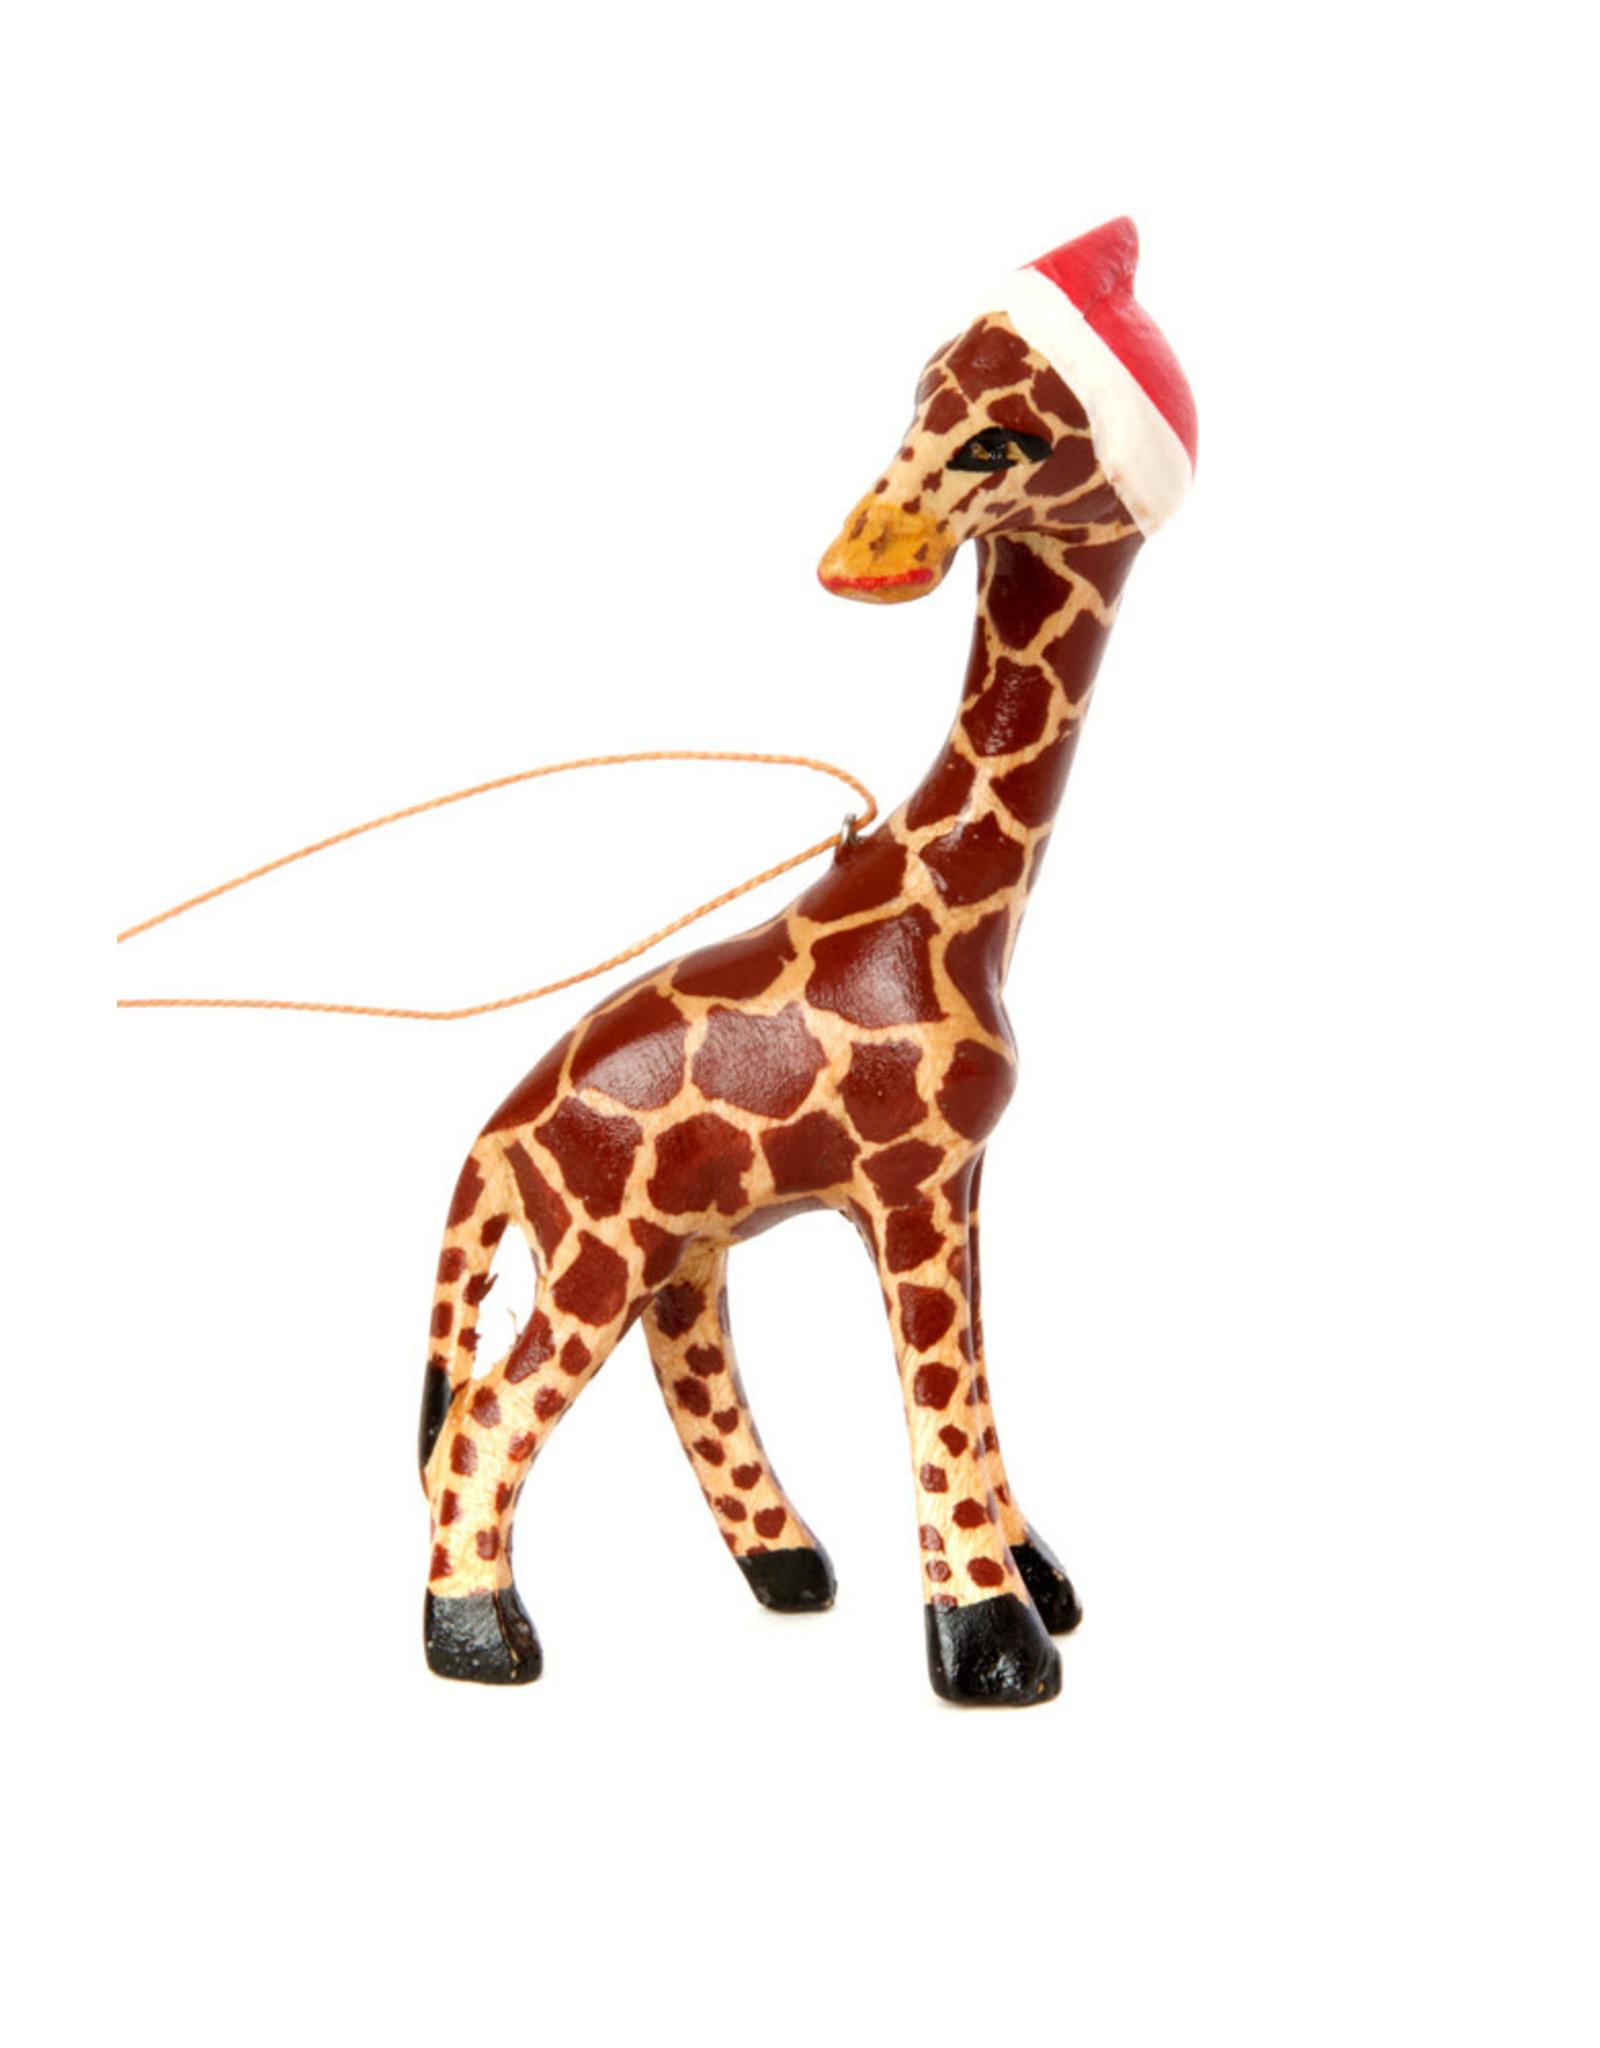 Swahili Wholesale Santa's Little Giraffe Helper Ornament, Kenya